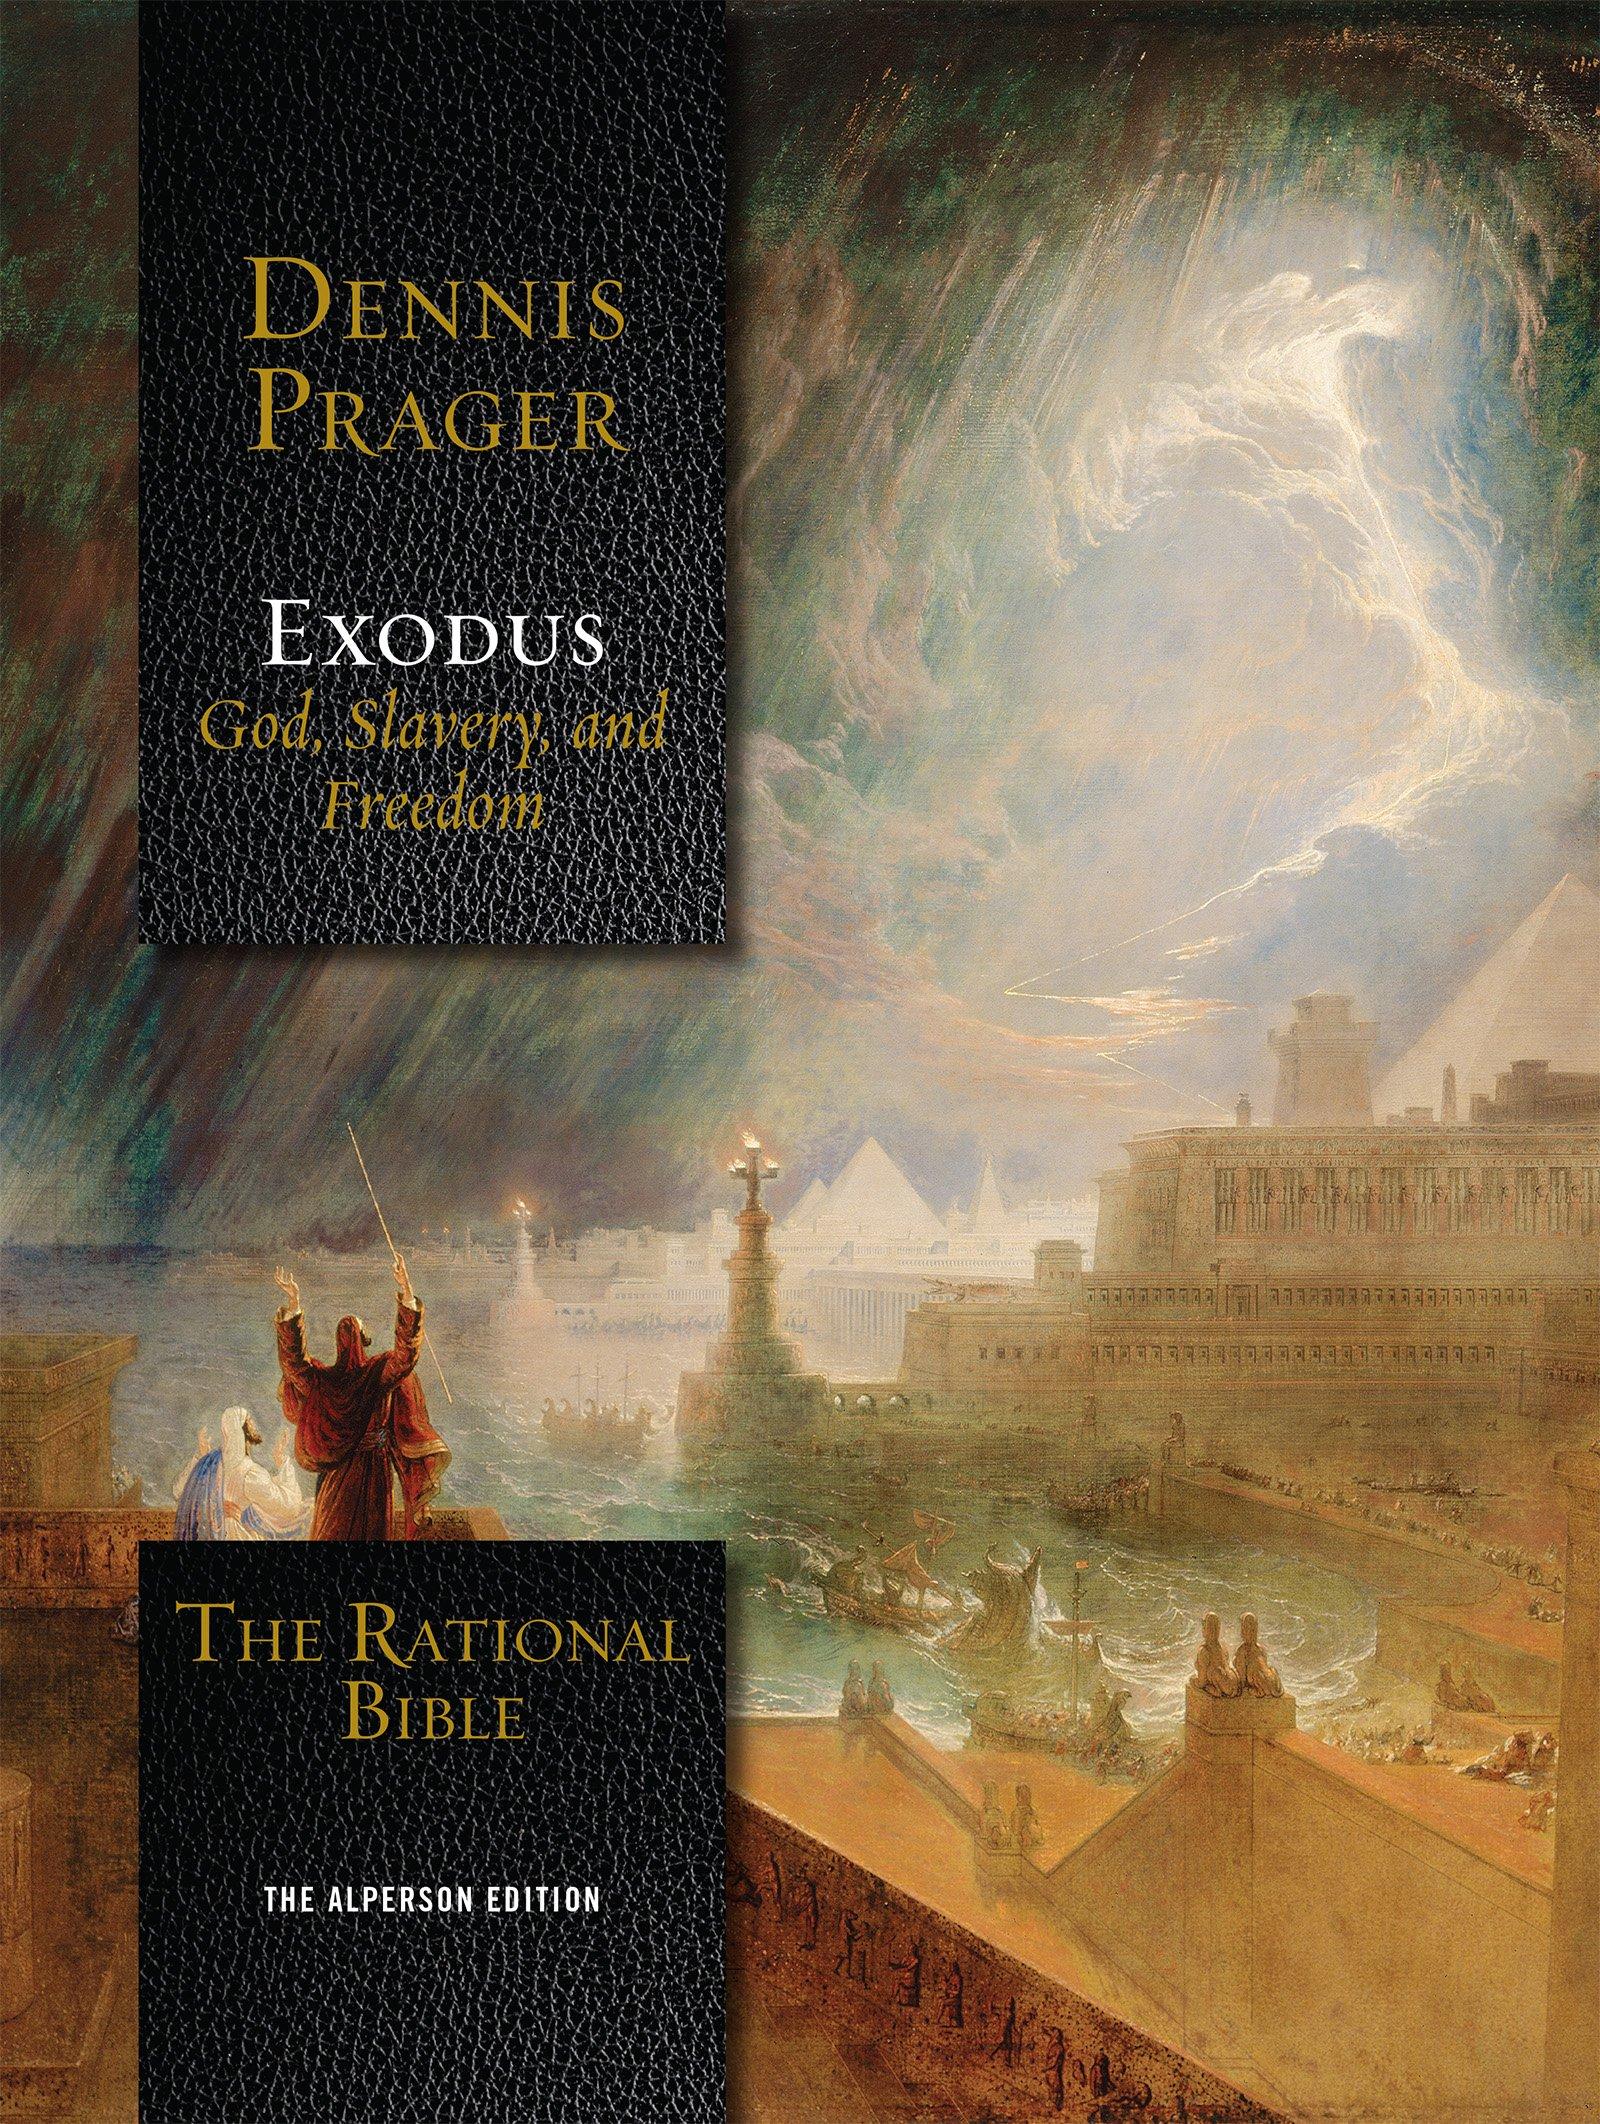 Rational-Bible-Exodus-2.jpg